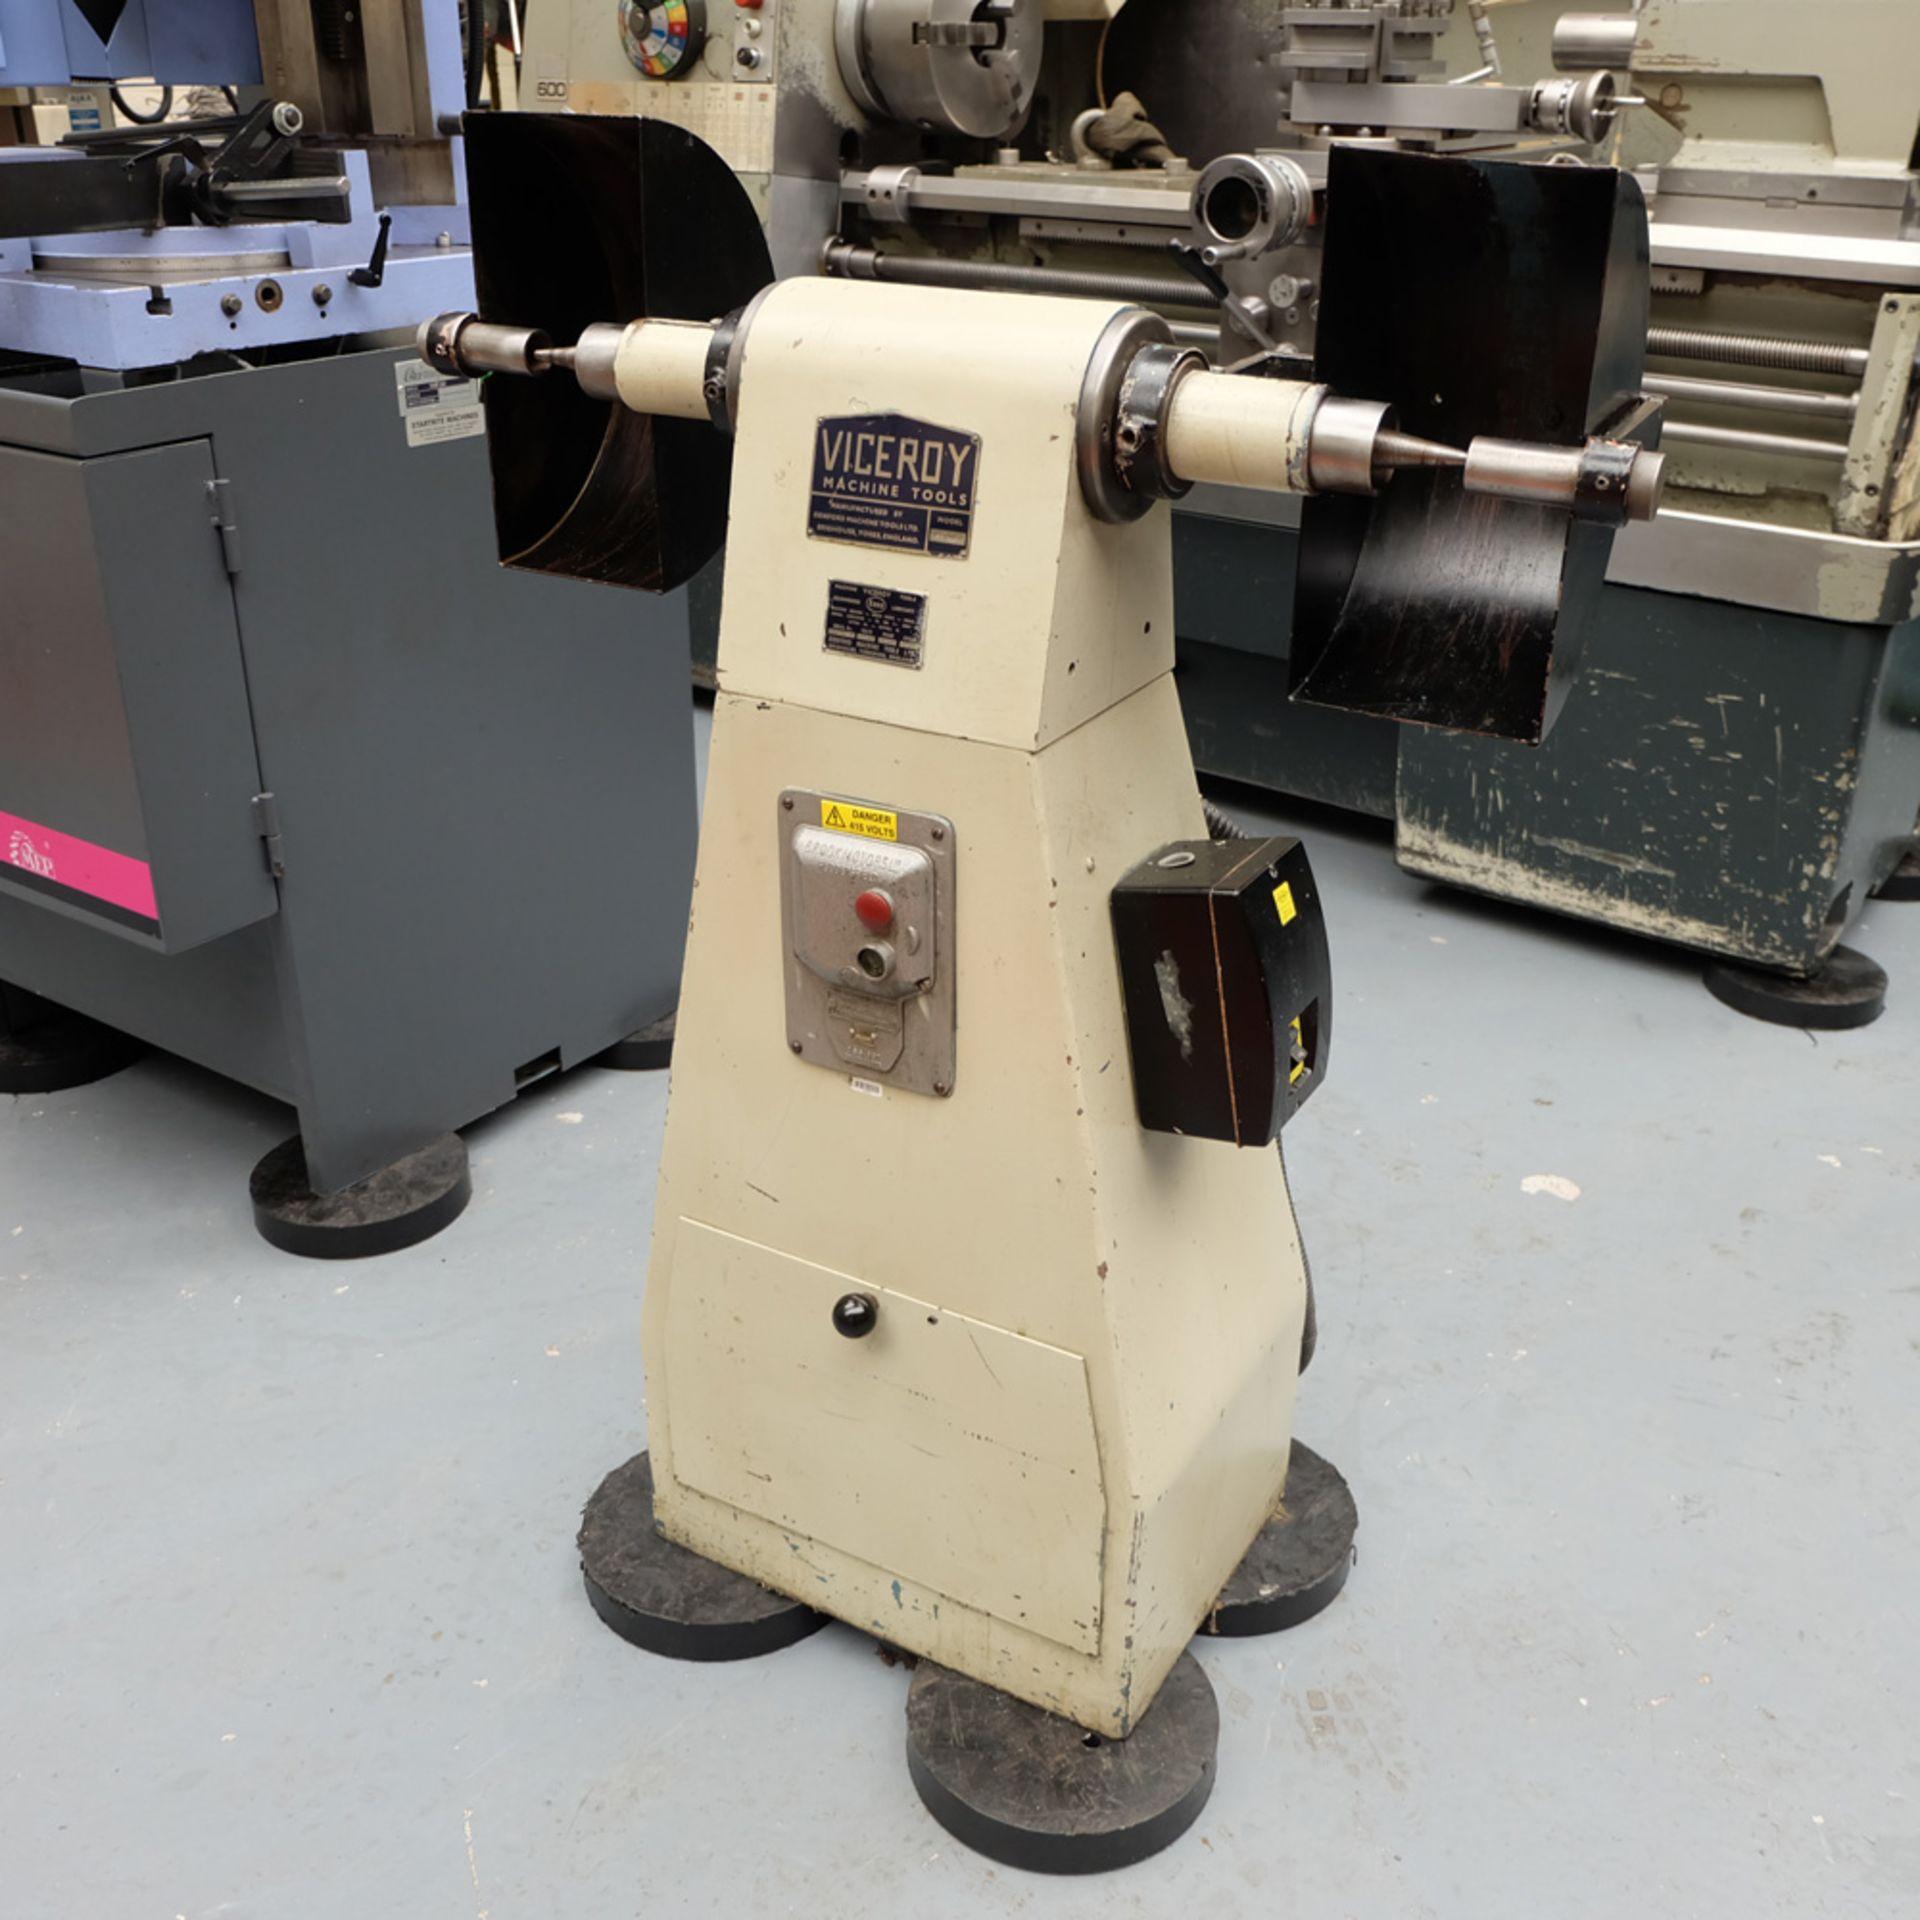 Viceroy Model TDS9 Double Ended Pedestal Polishing Machine. - Image 2 of 6